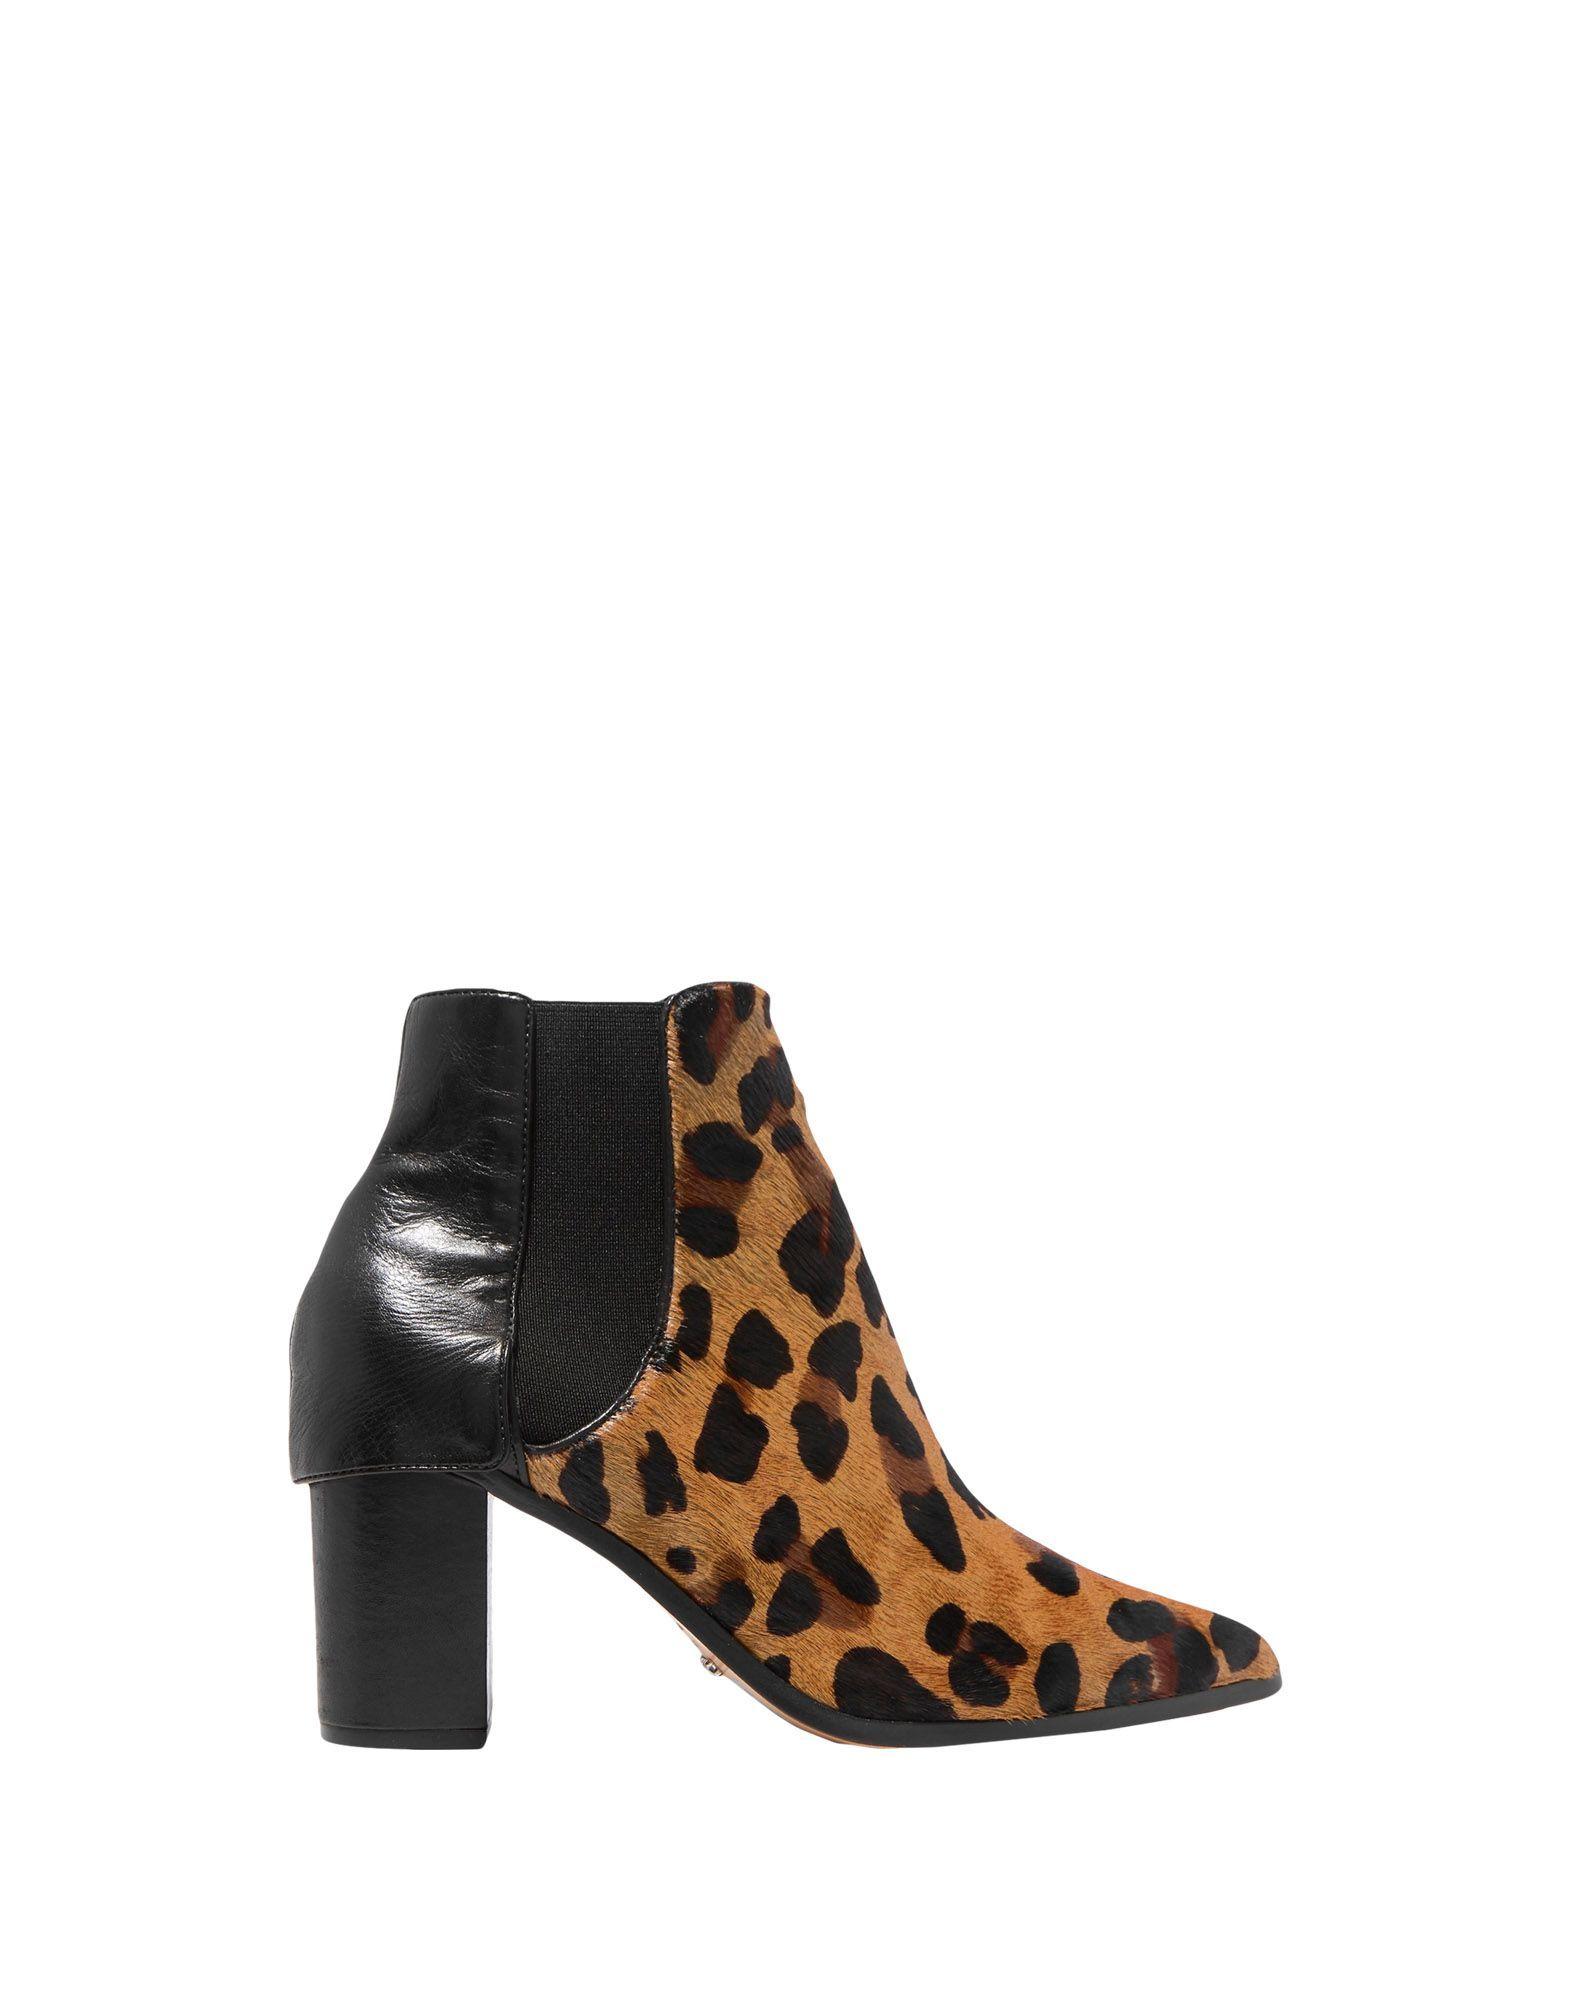 Schutz Camel Leopard Print Leather Ankle Boots